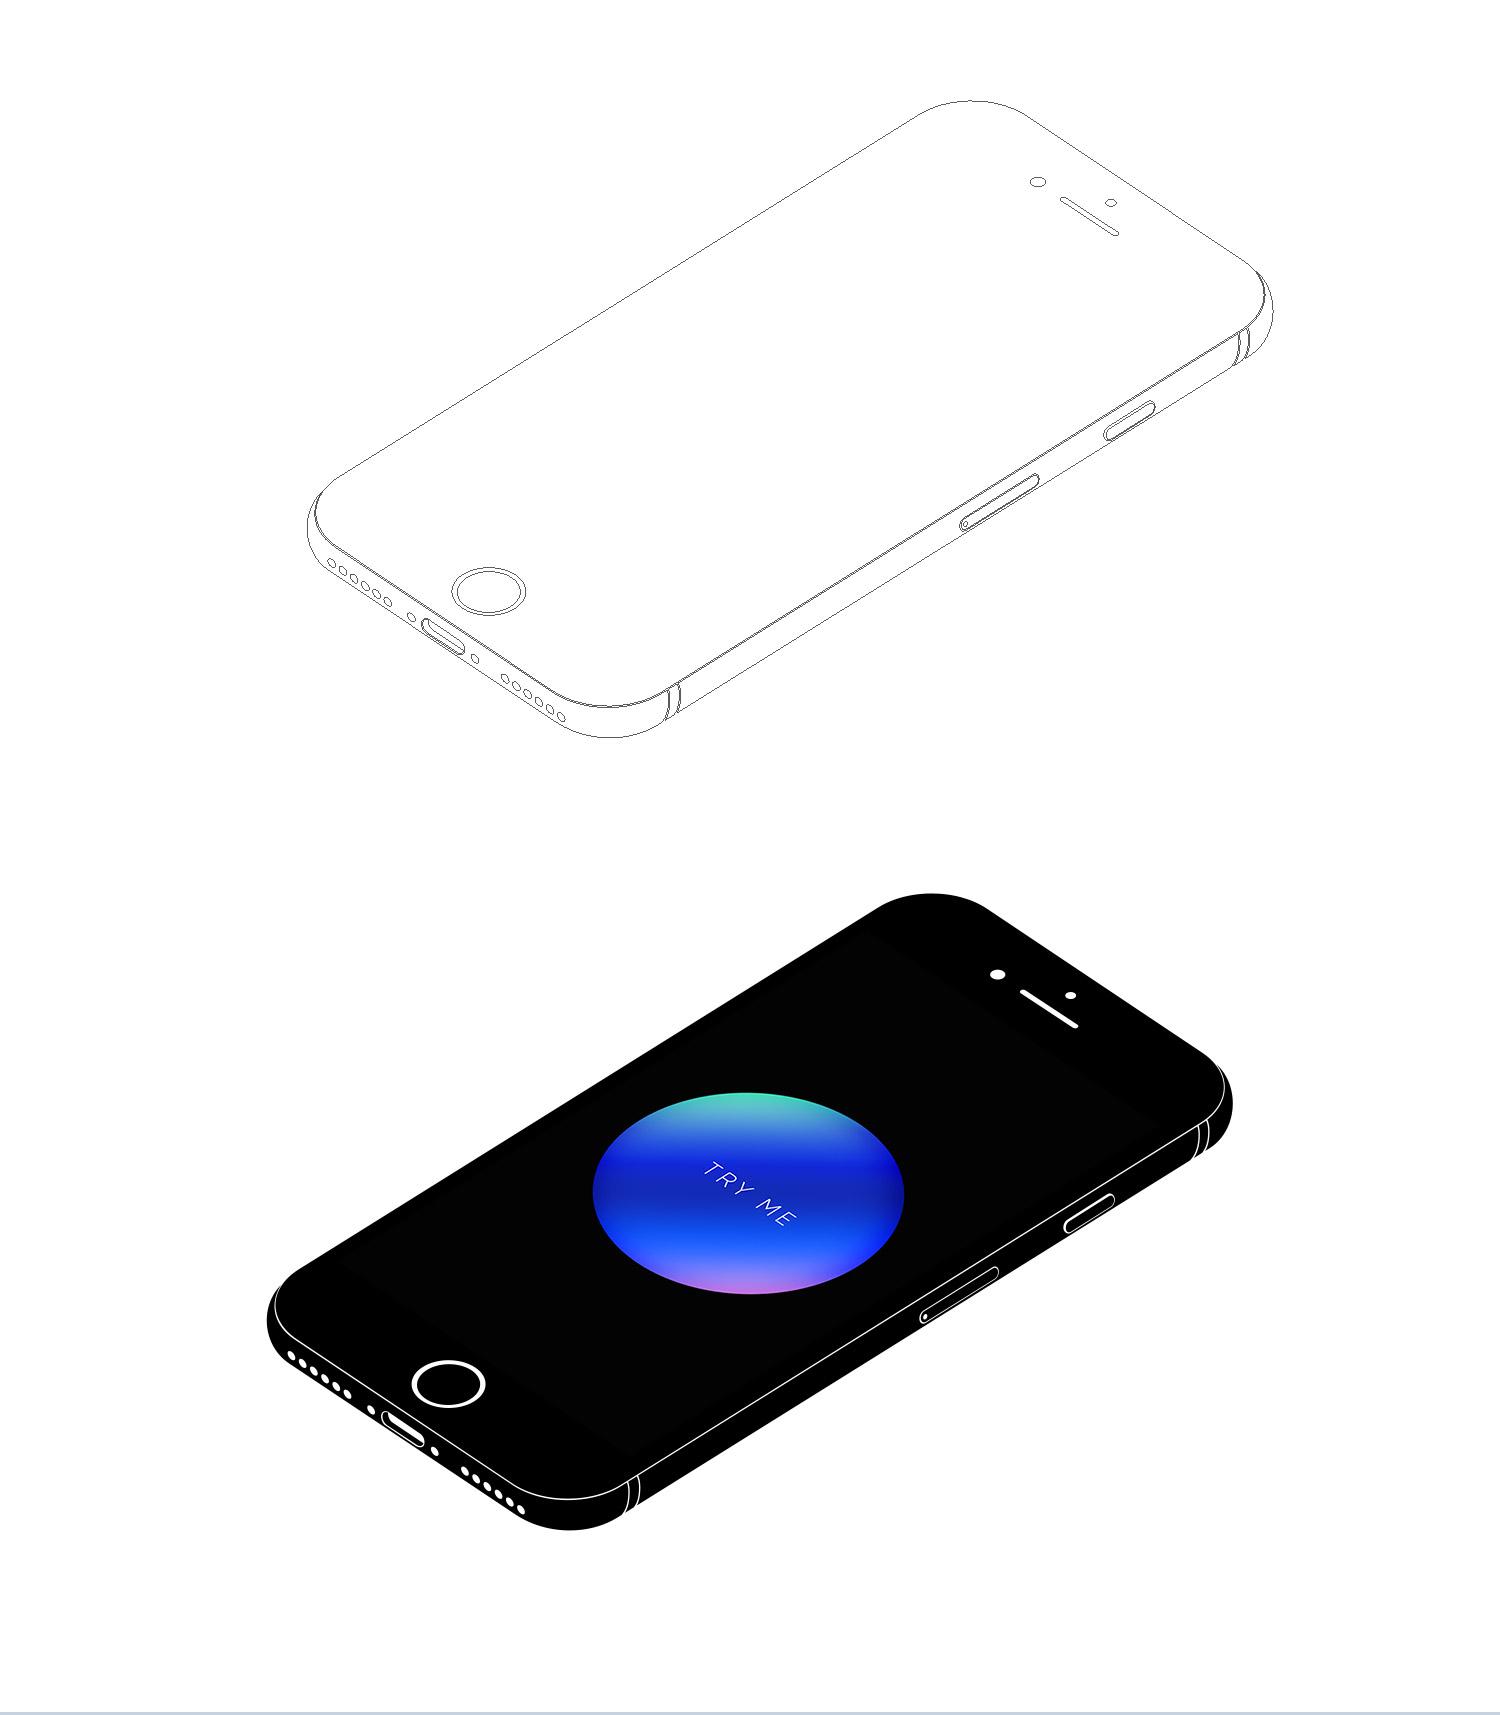 iPhone 7 Isometric Mockup Presentation - 3